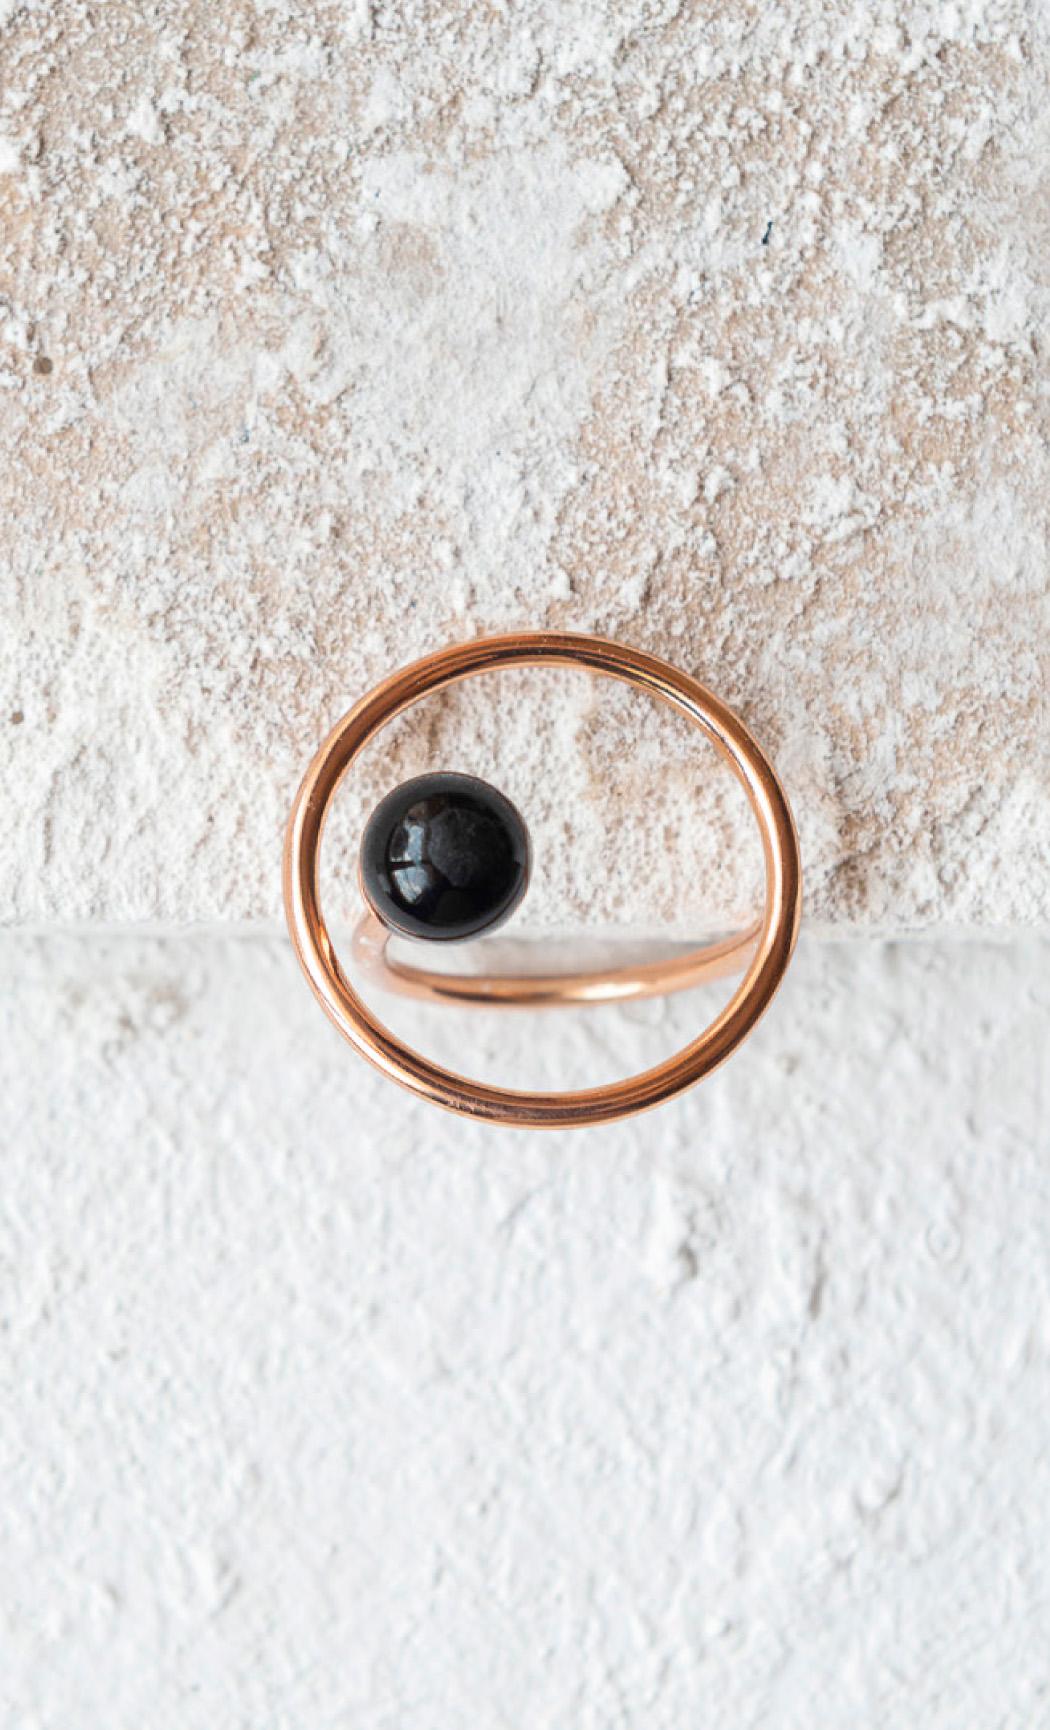 Orbital Black Onyx Ring - Buy Now.